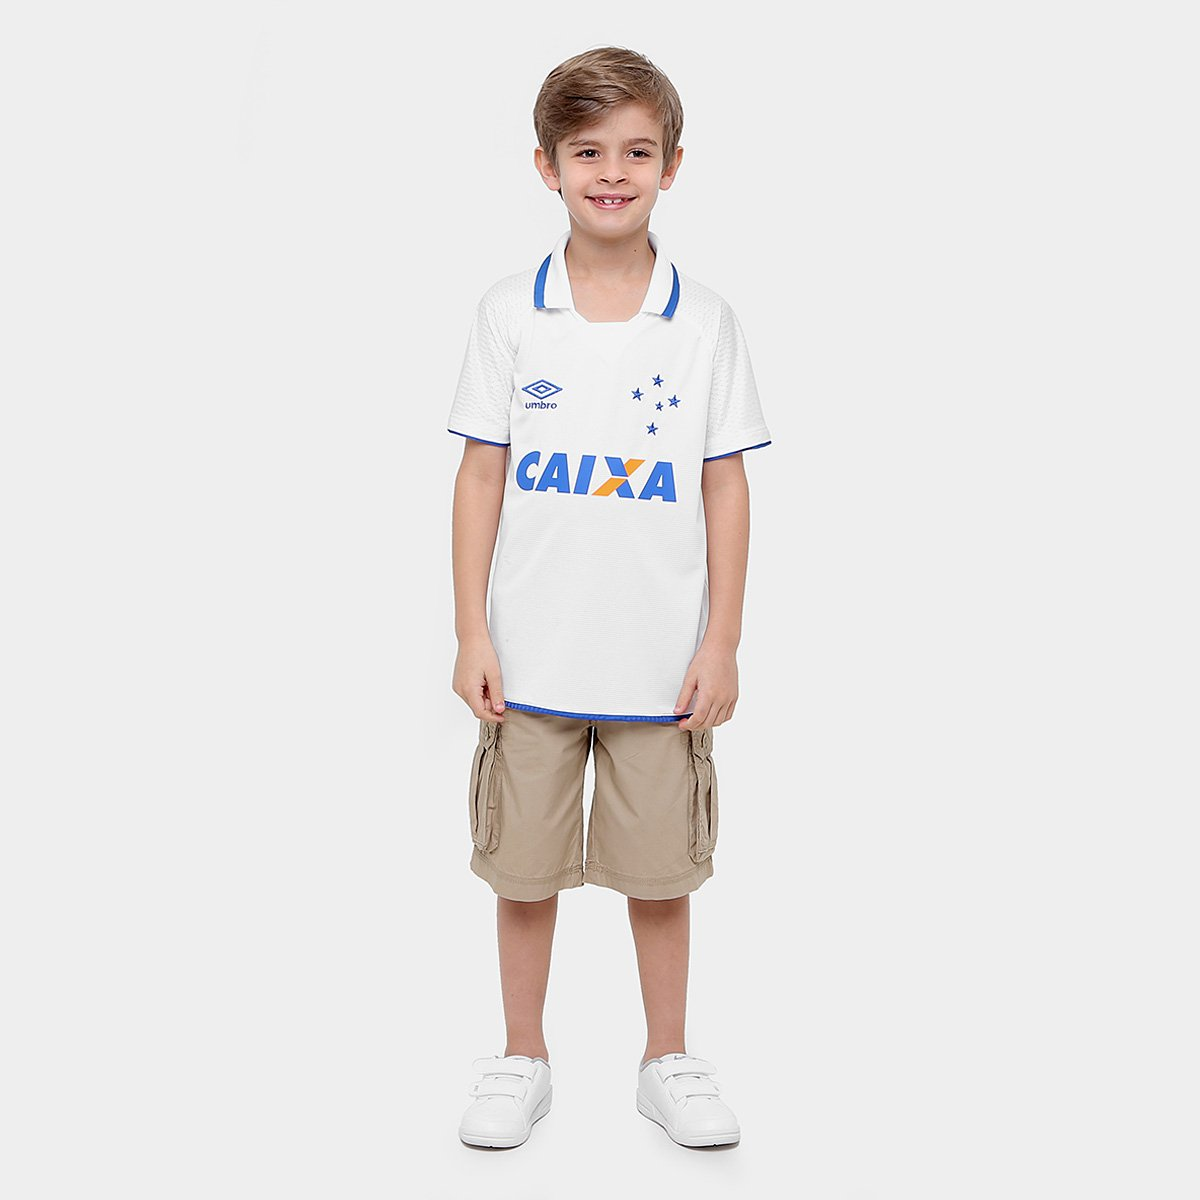 ... Umbro 17 s Torcedor Cruzeiro Branco e Azul Camisa nº II 18 Infantil  nqxAfW8BwC 420cafb0088b1